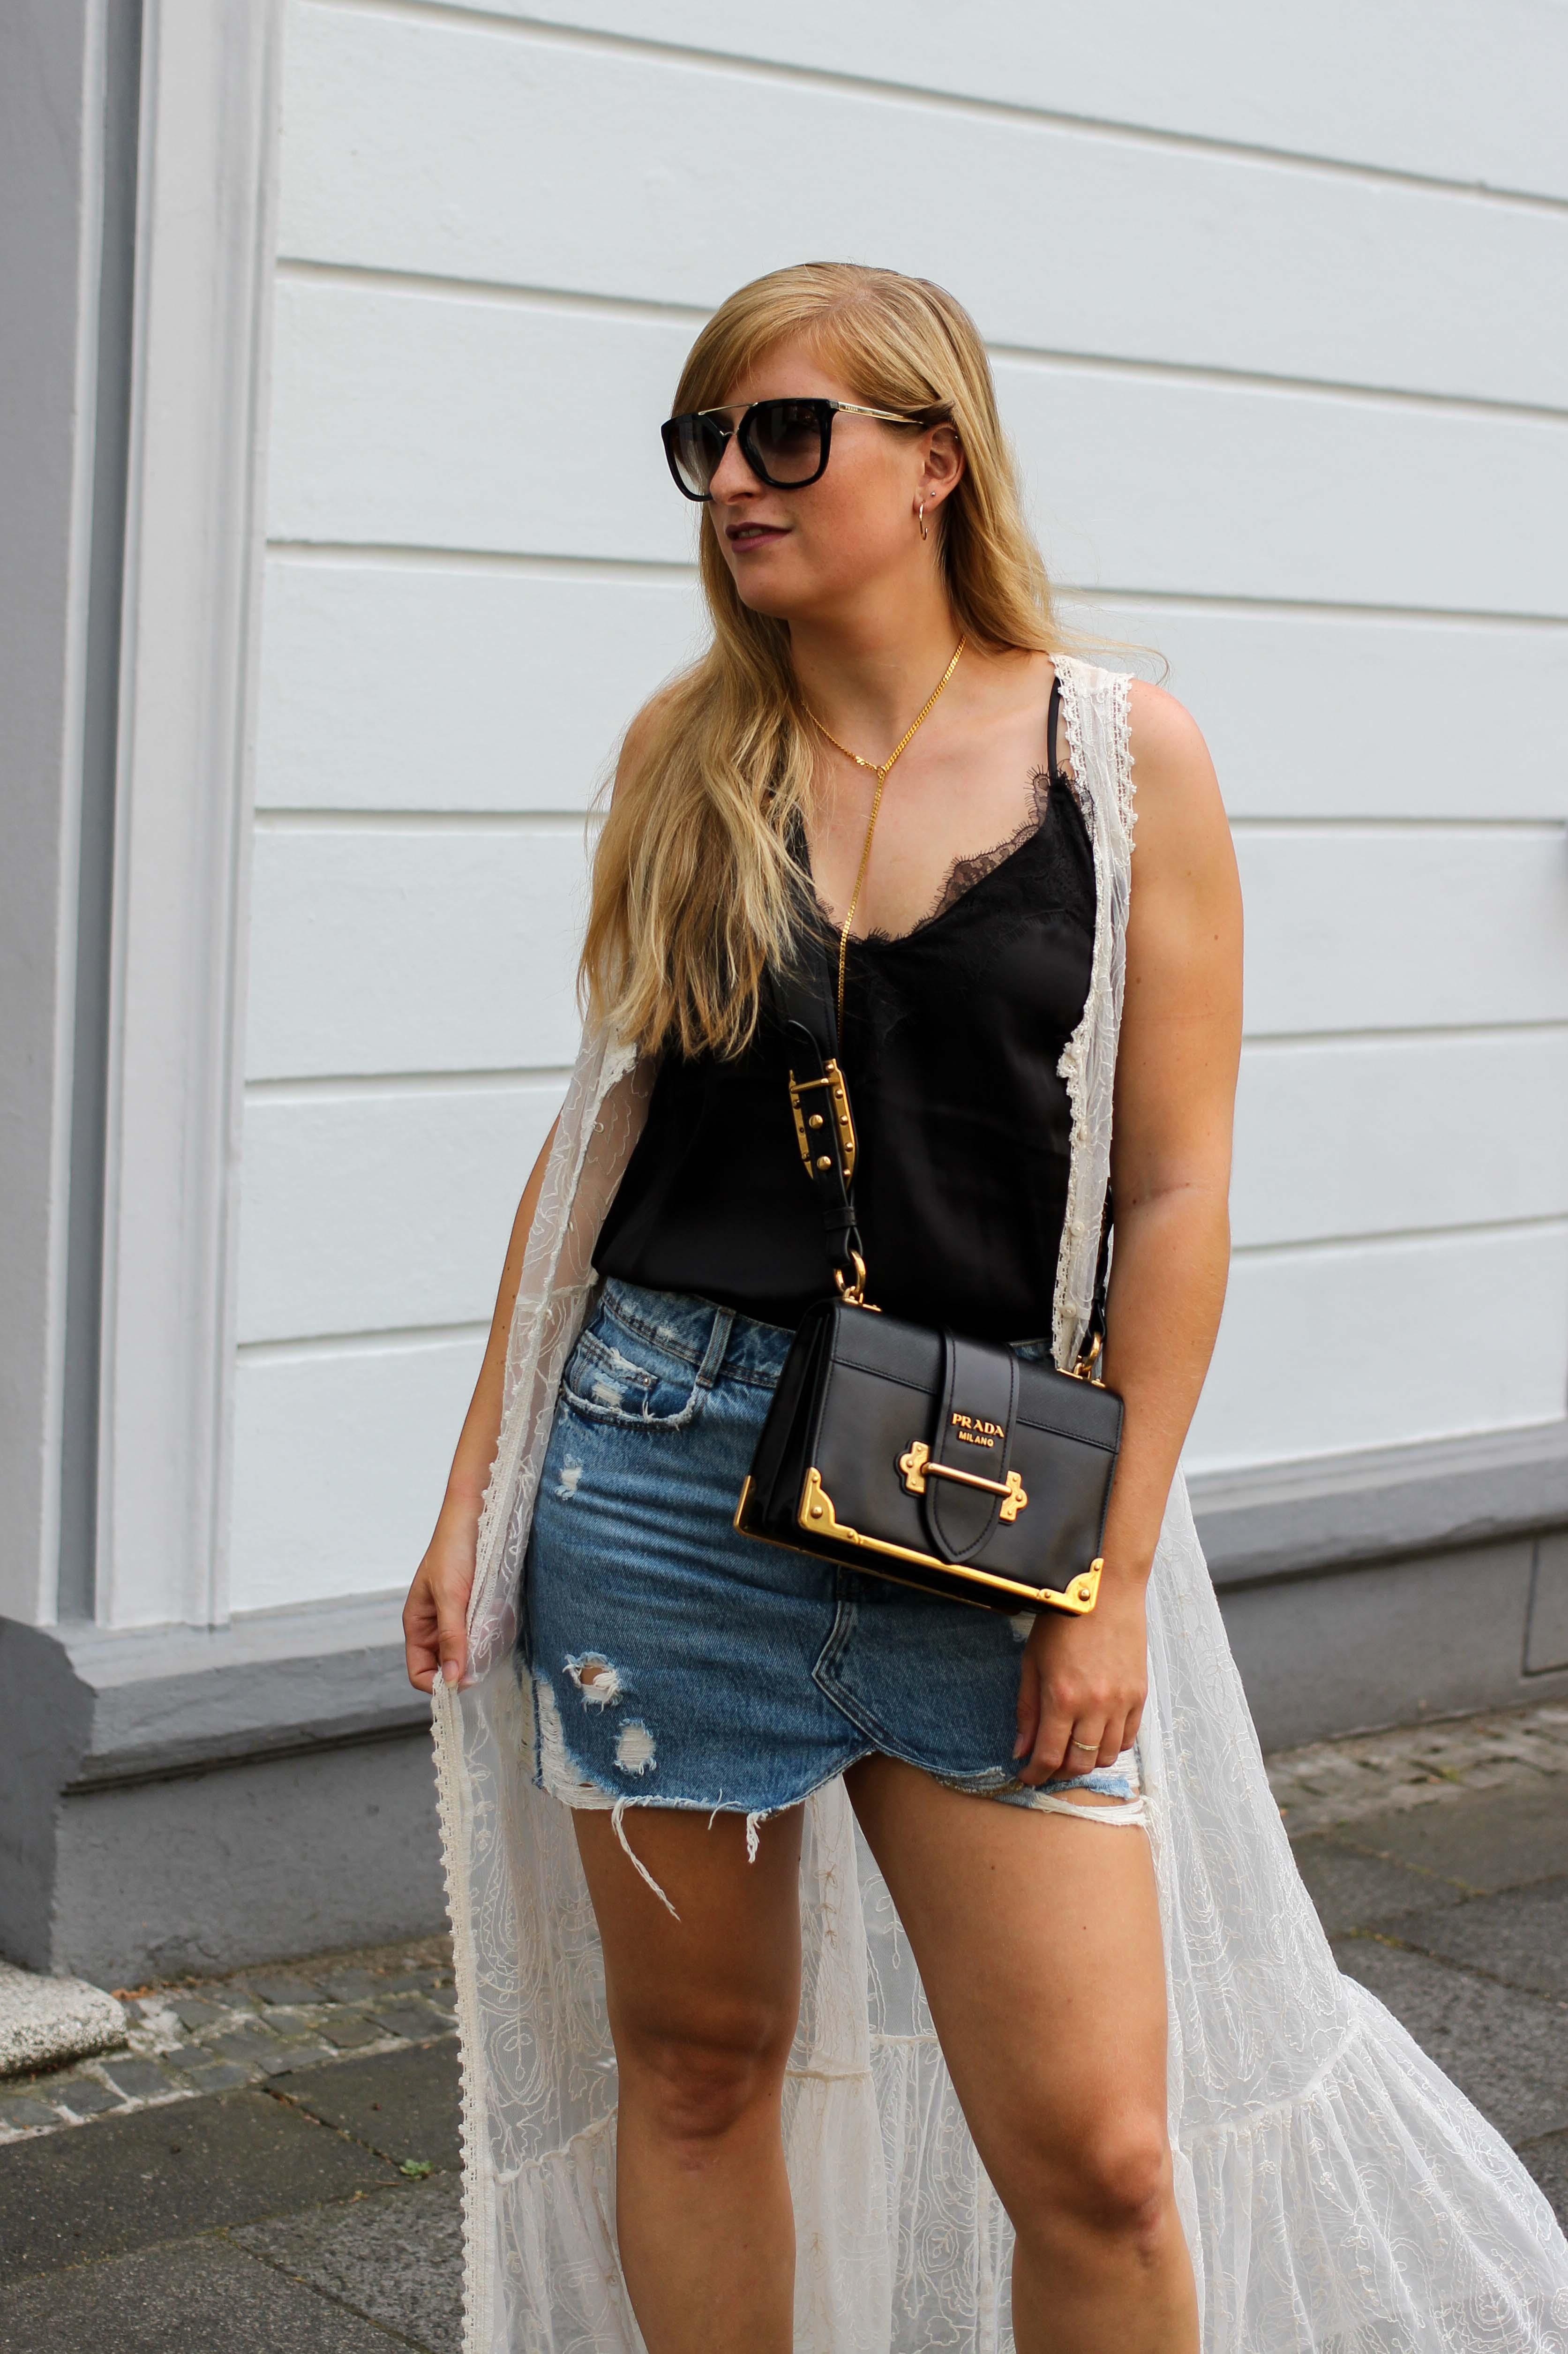 Spitzentop Jeansrock Boho Sommermantel Boho Sommerlook kombinieren Ibiza Style Hippie Modeblog Outfit Prada Cahier Schwarz Gold 4